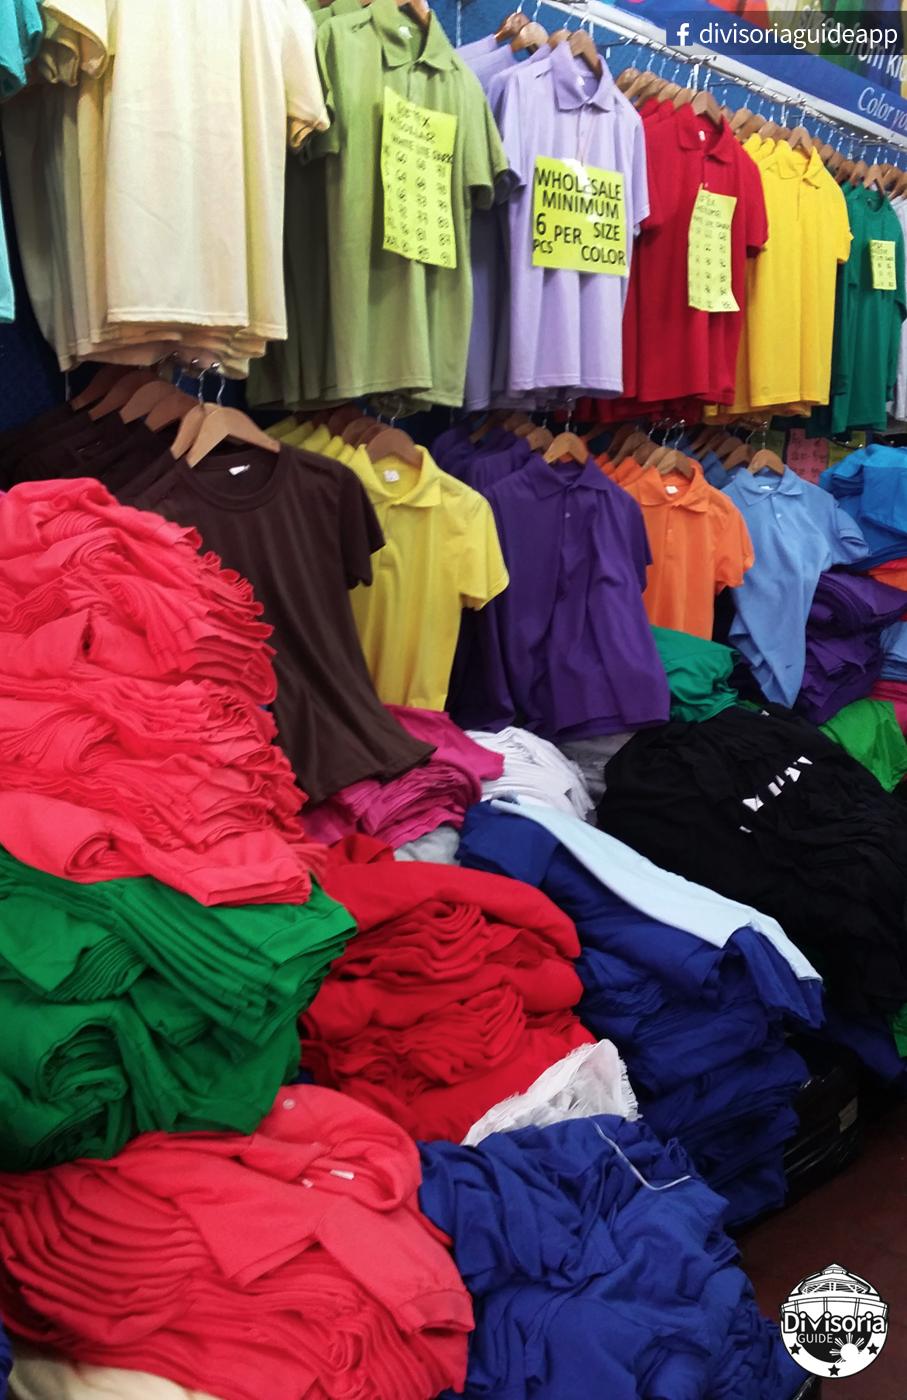 382f5895 Outsource your t-shirt and polo shirt needs in Juan Luna St., Divisoria  (from San Lorenzo Ruiz Plaza to Juan Luna Plaza) :) Photo taken from Uni  Shirt ...